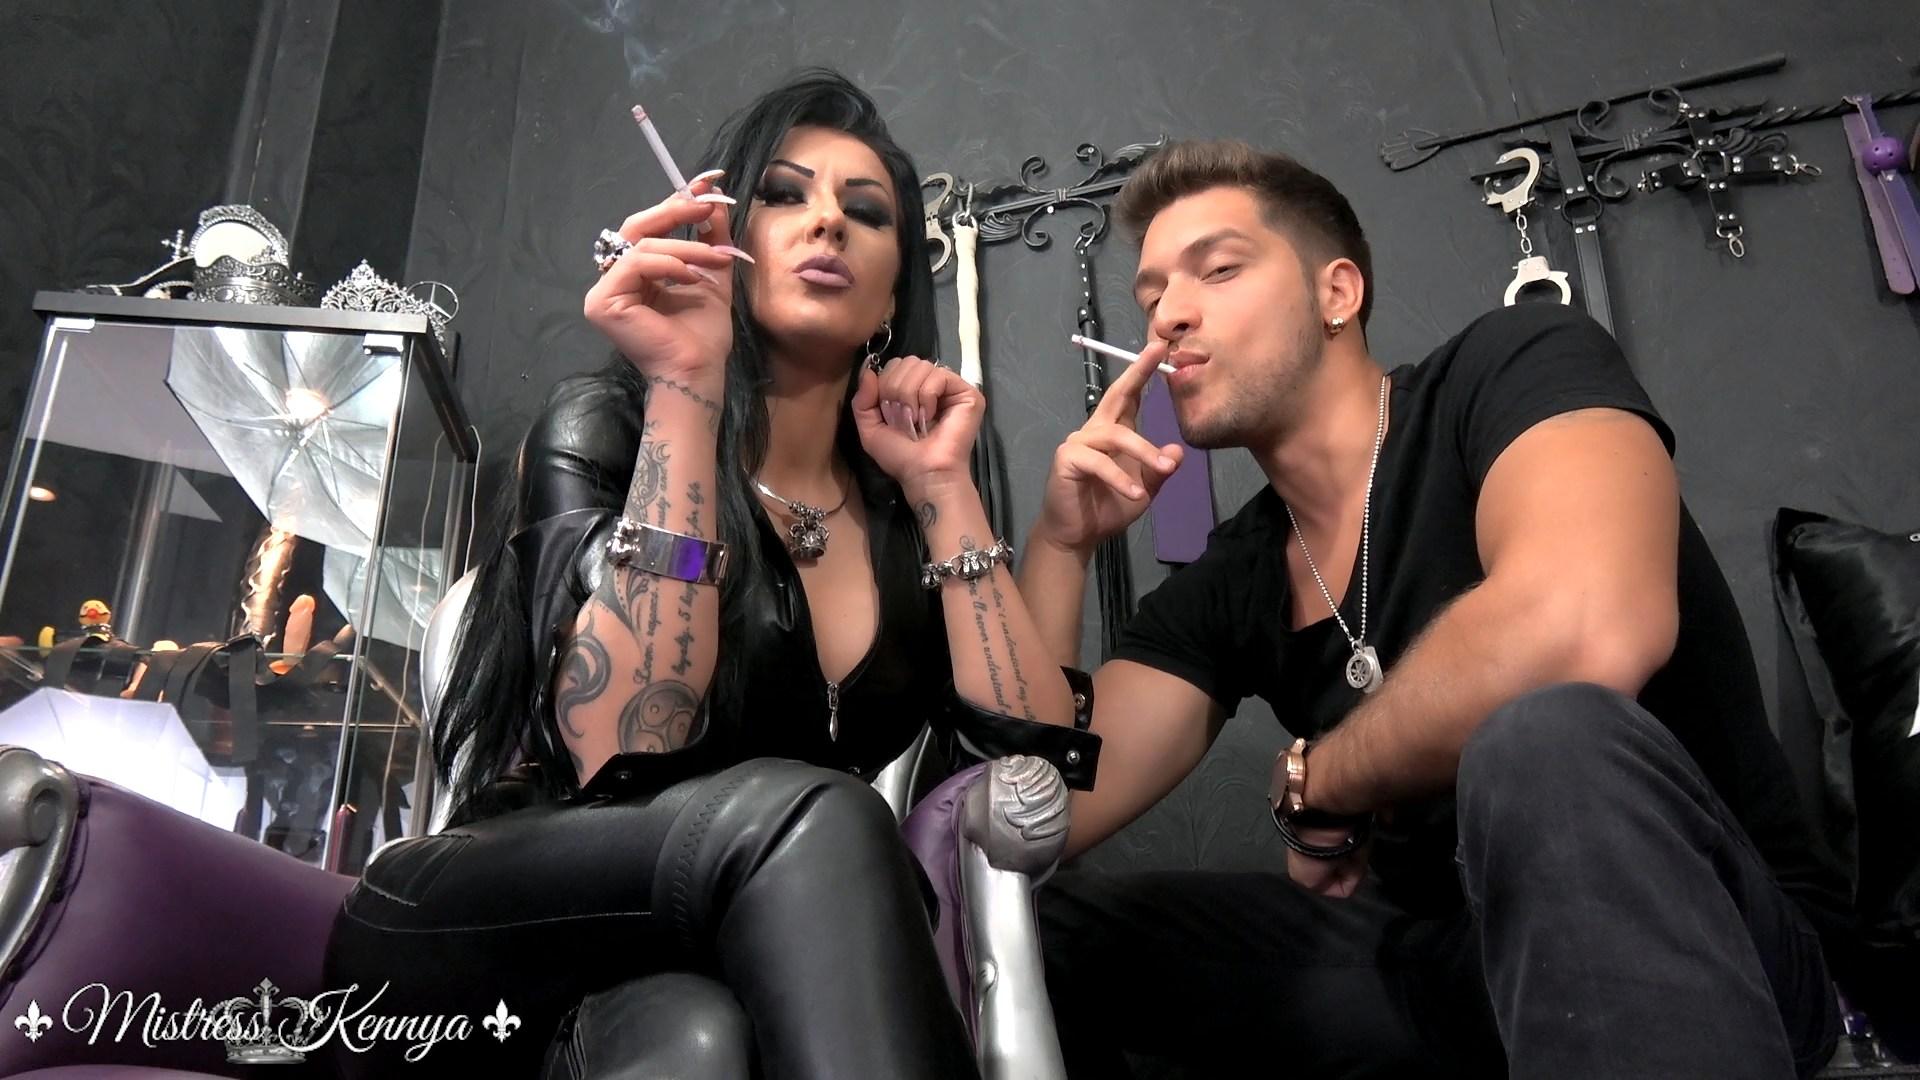 Mistress_Kennya_Ash_from_My_lover_for_My_loser_cuck.mp4_snapshot_00.49__2018.04.10_15.03.29_.jpg